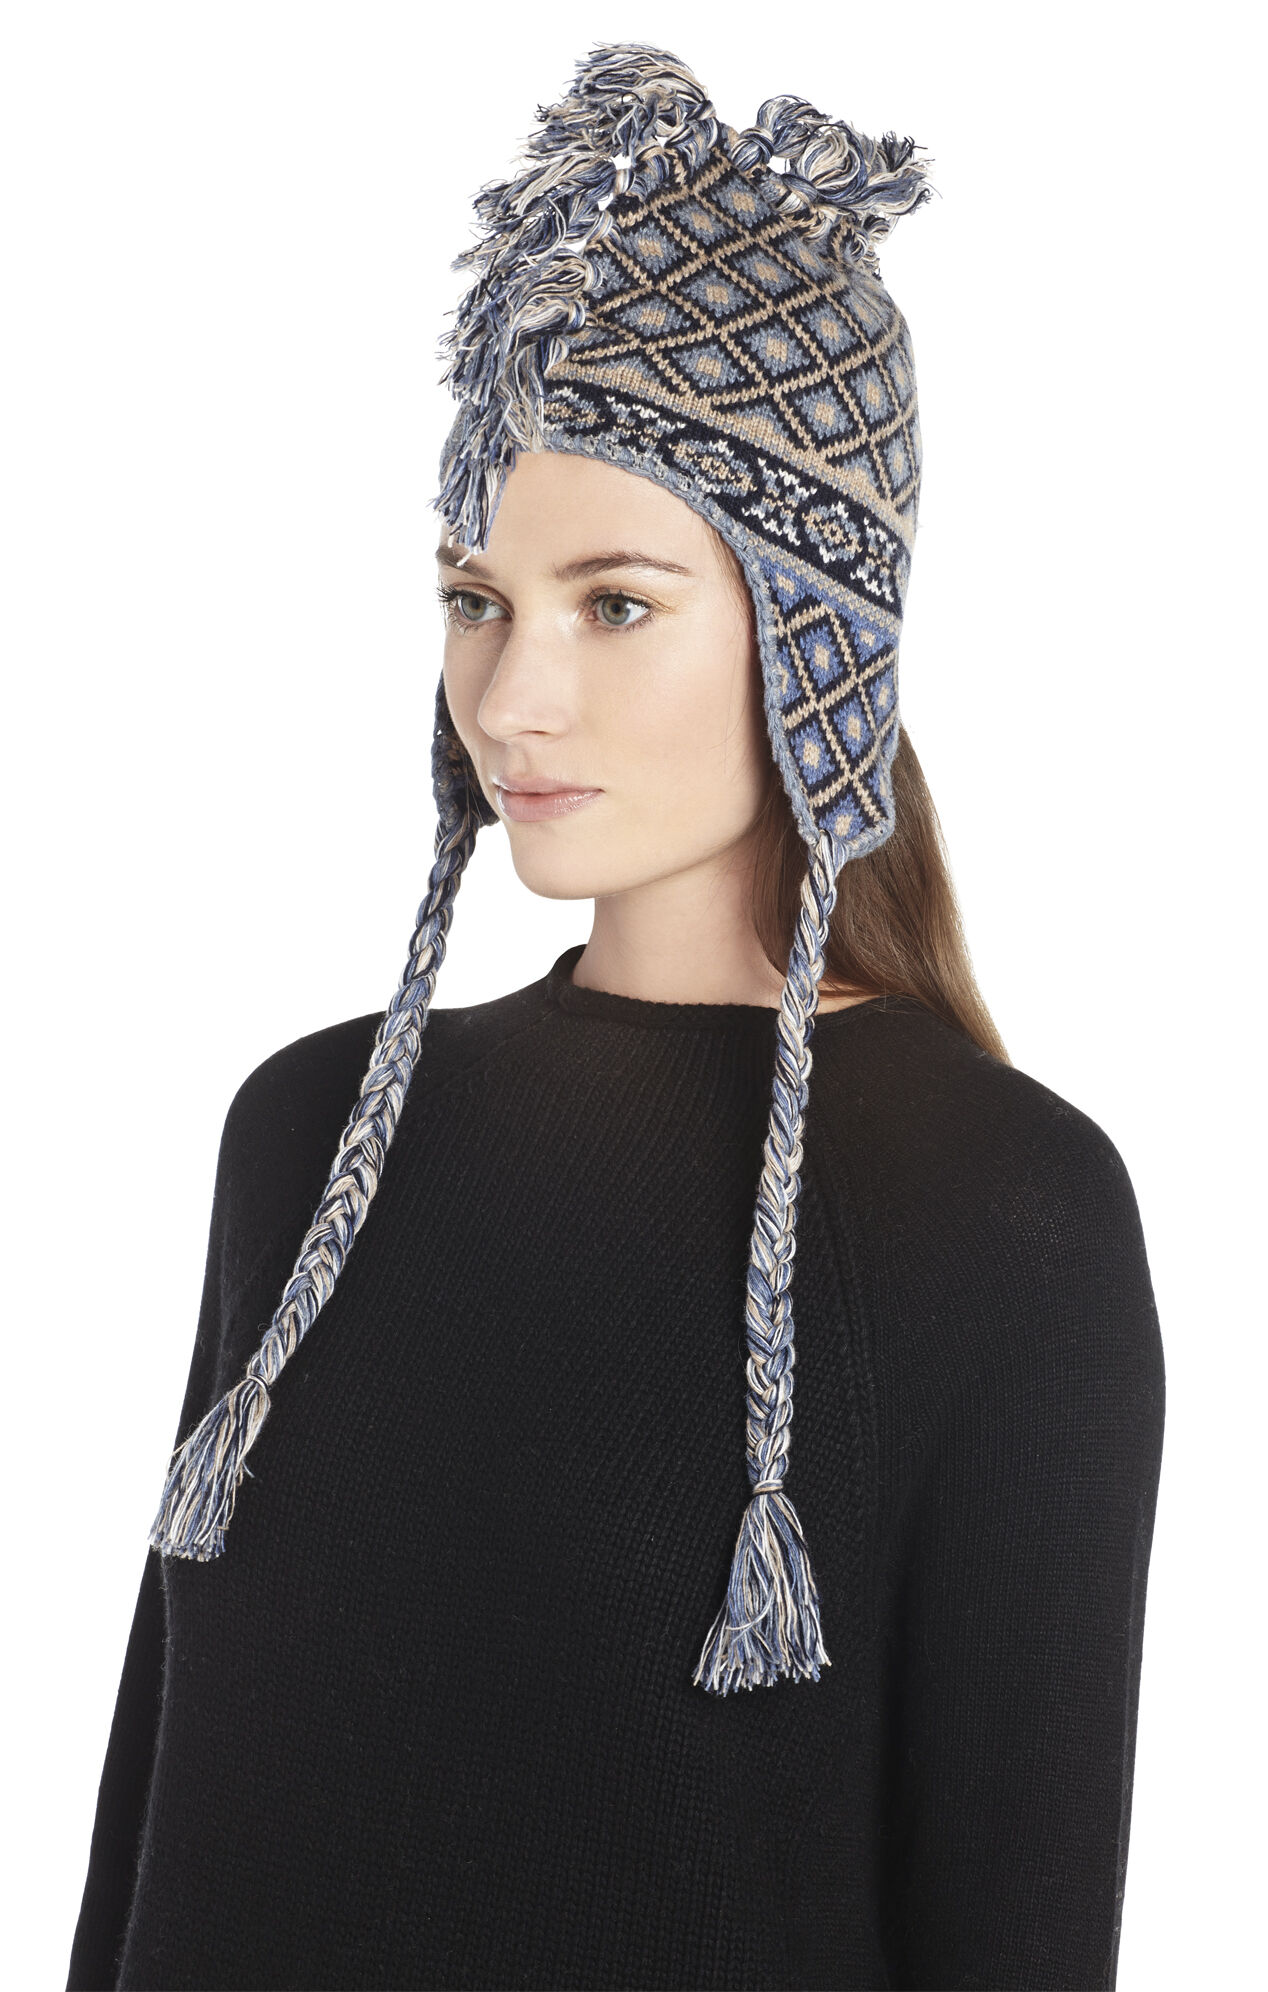 Braided-Tassel Mohawk Helmet Hat